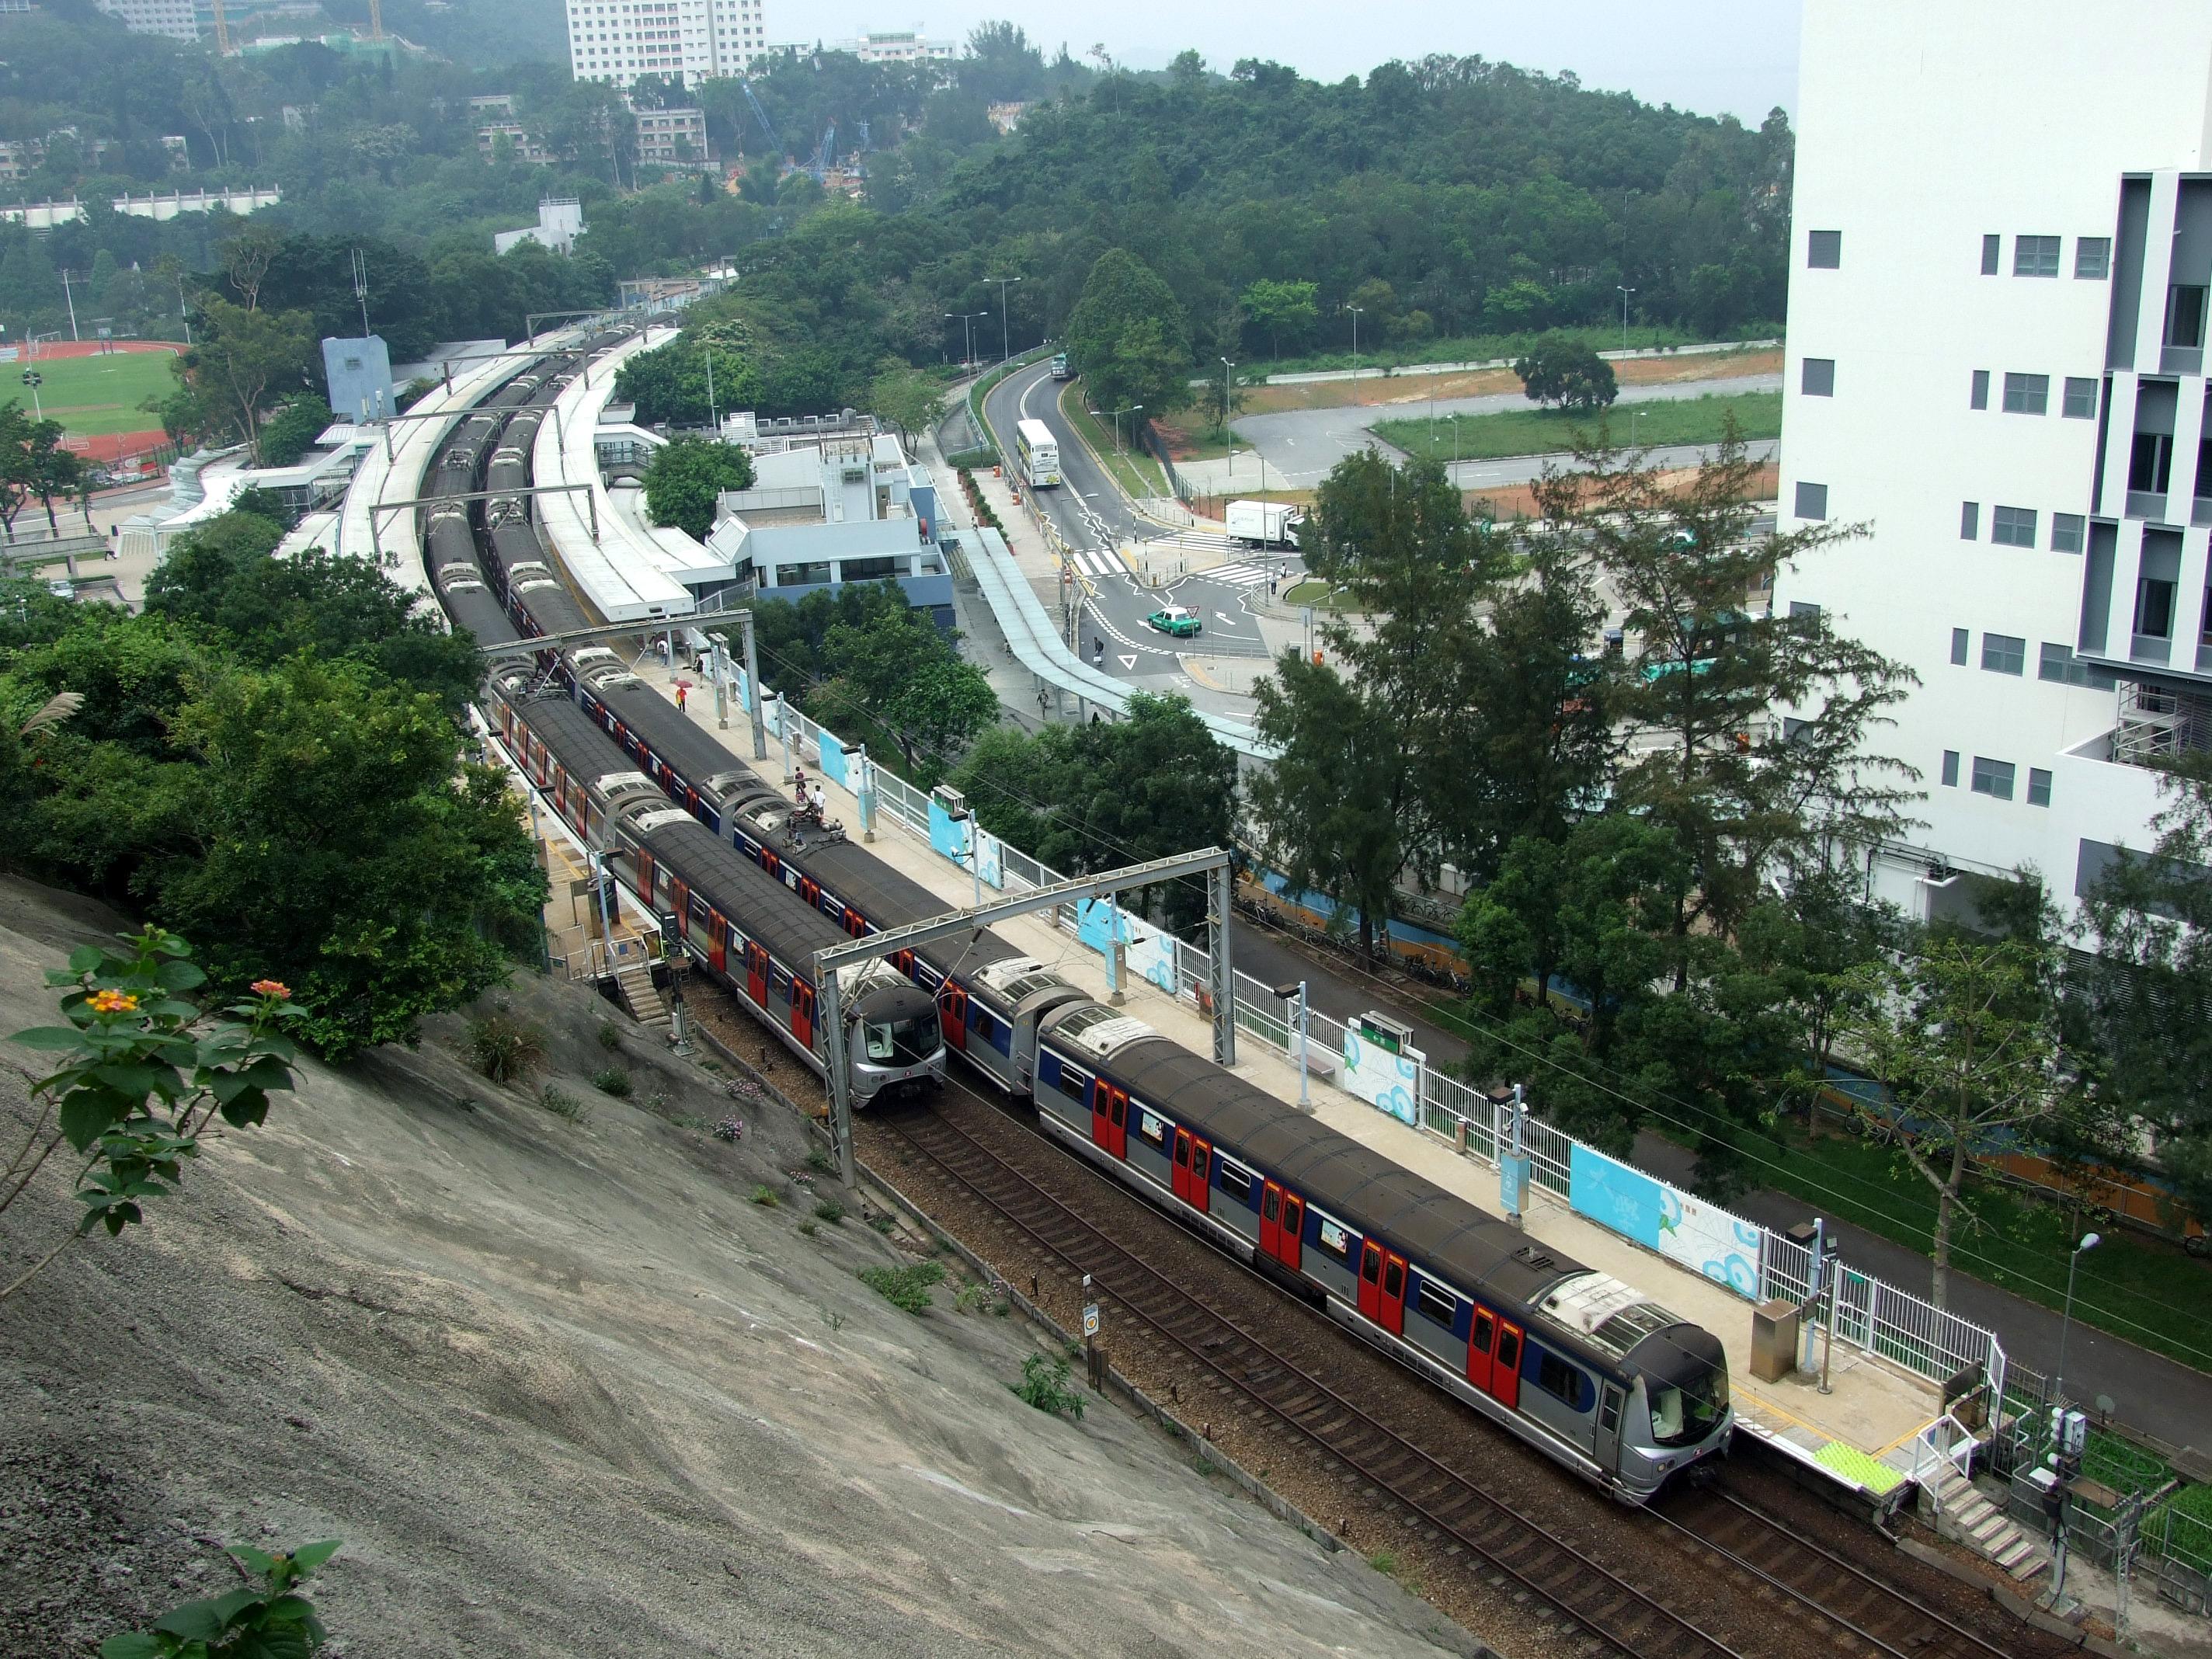 University station (MTR)